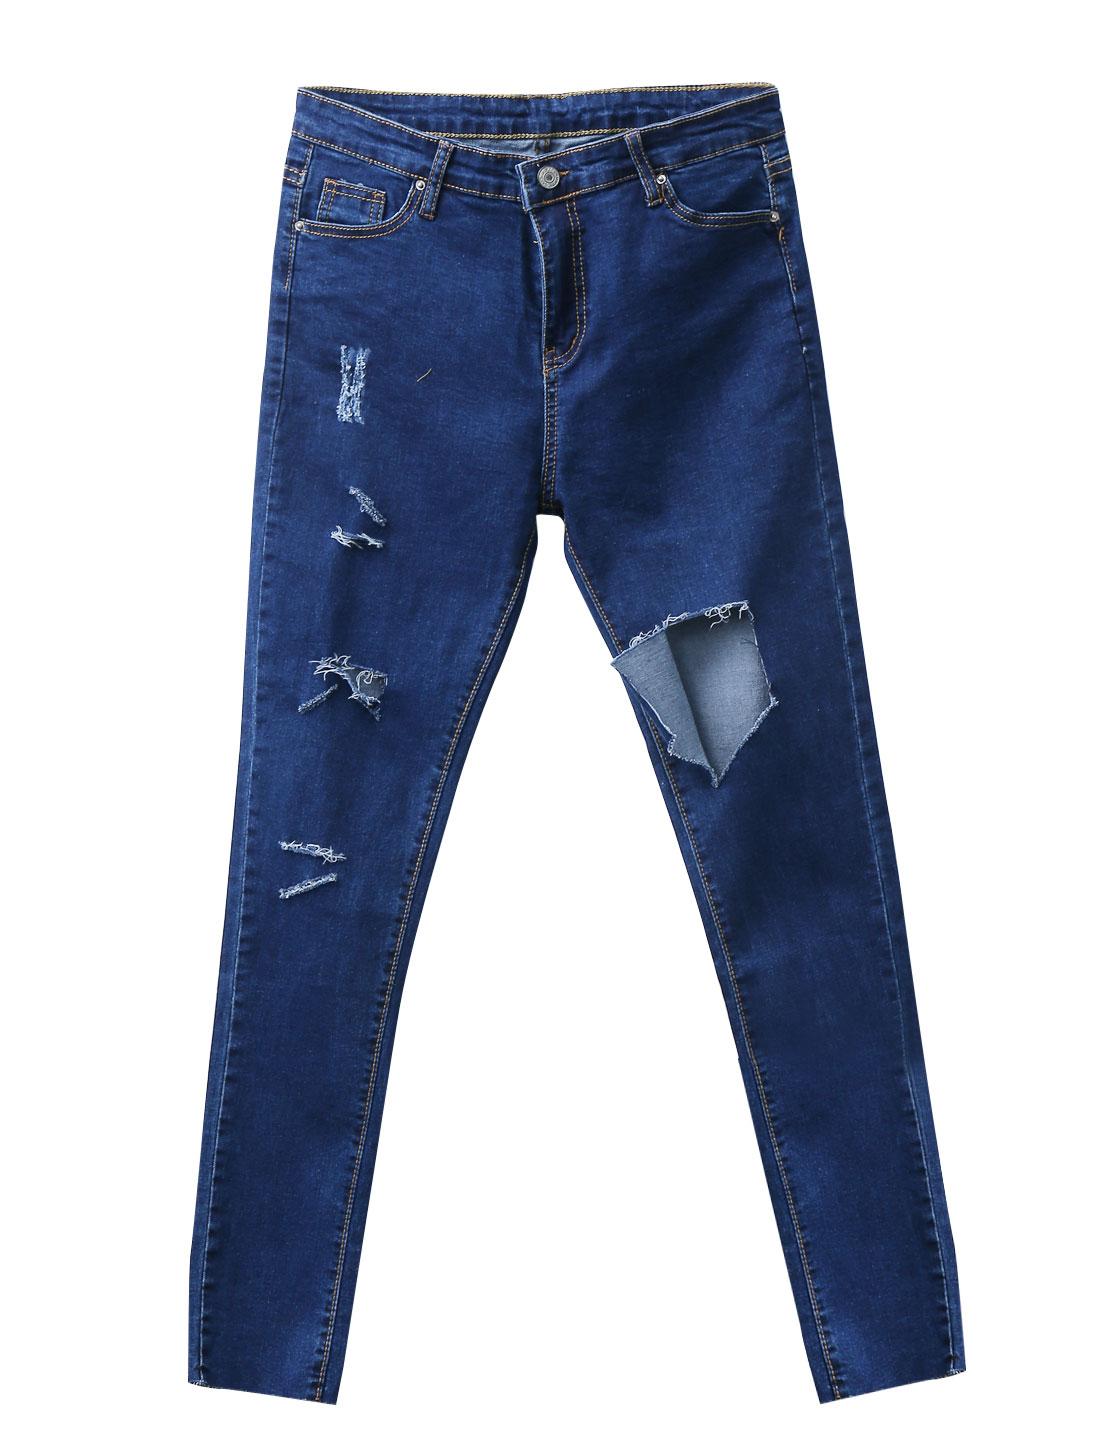 Women Belt Loop Button Closure Zip Fly Destroyed Slim Denim Pants Blue M